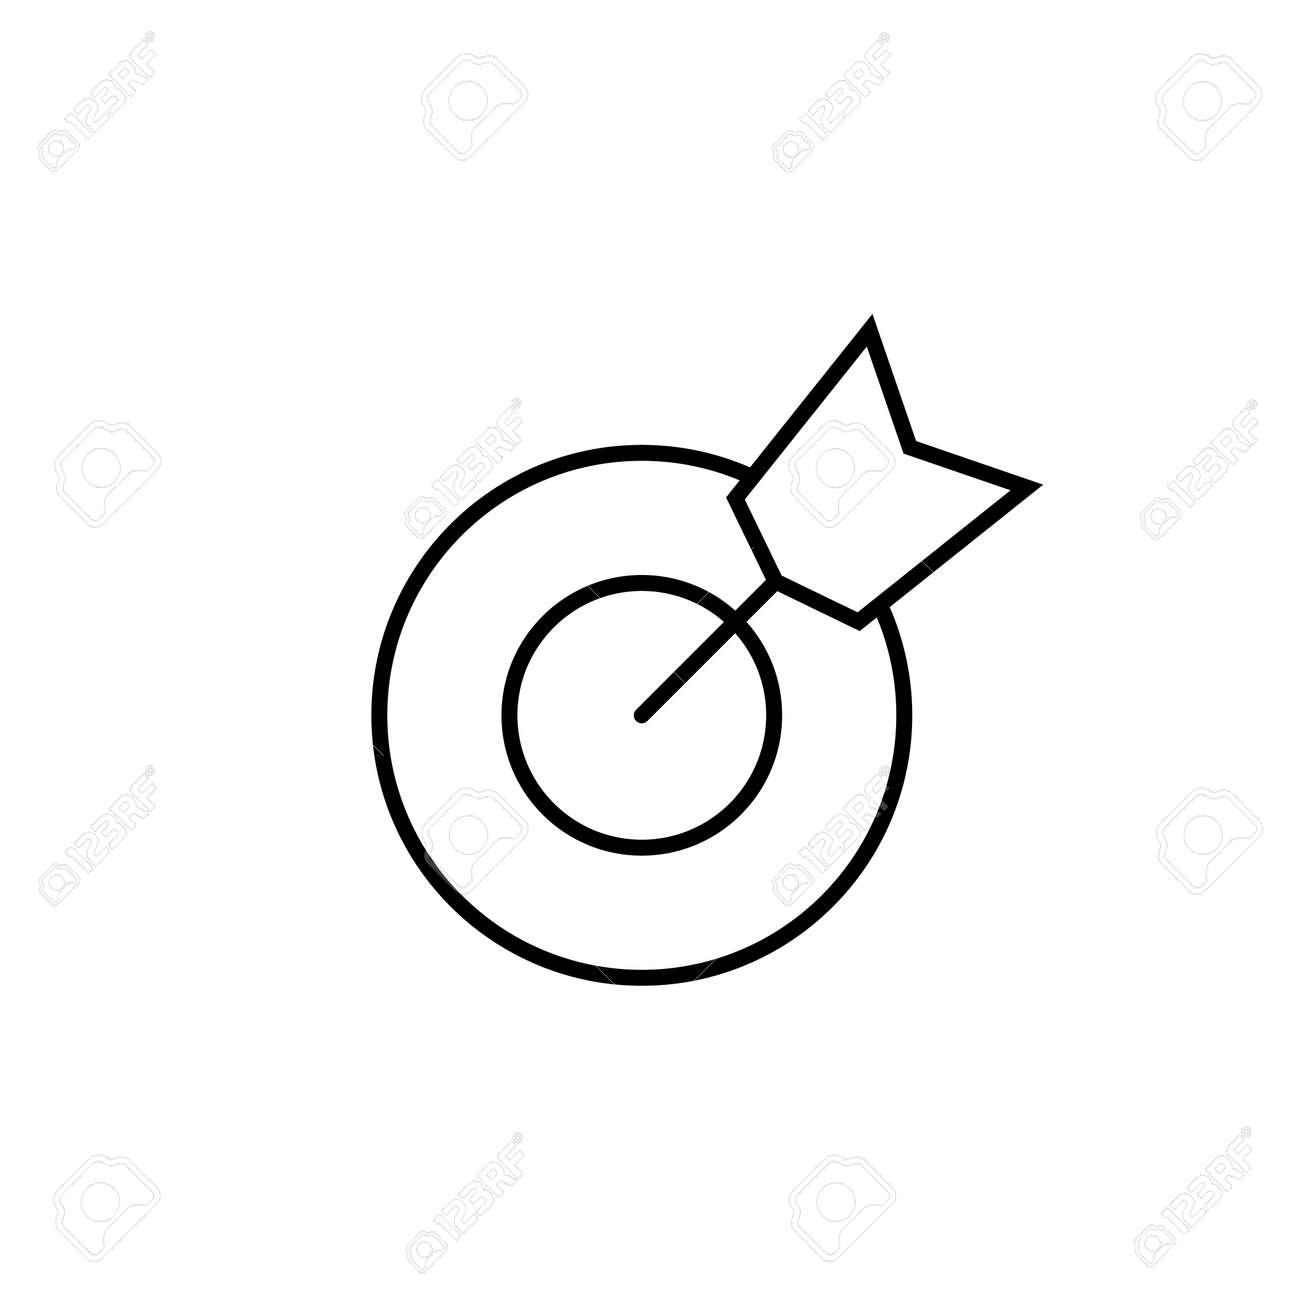 Target icon vector. goal icon vector. target marketing icon vector - 164530637